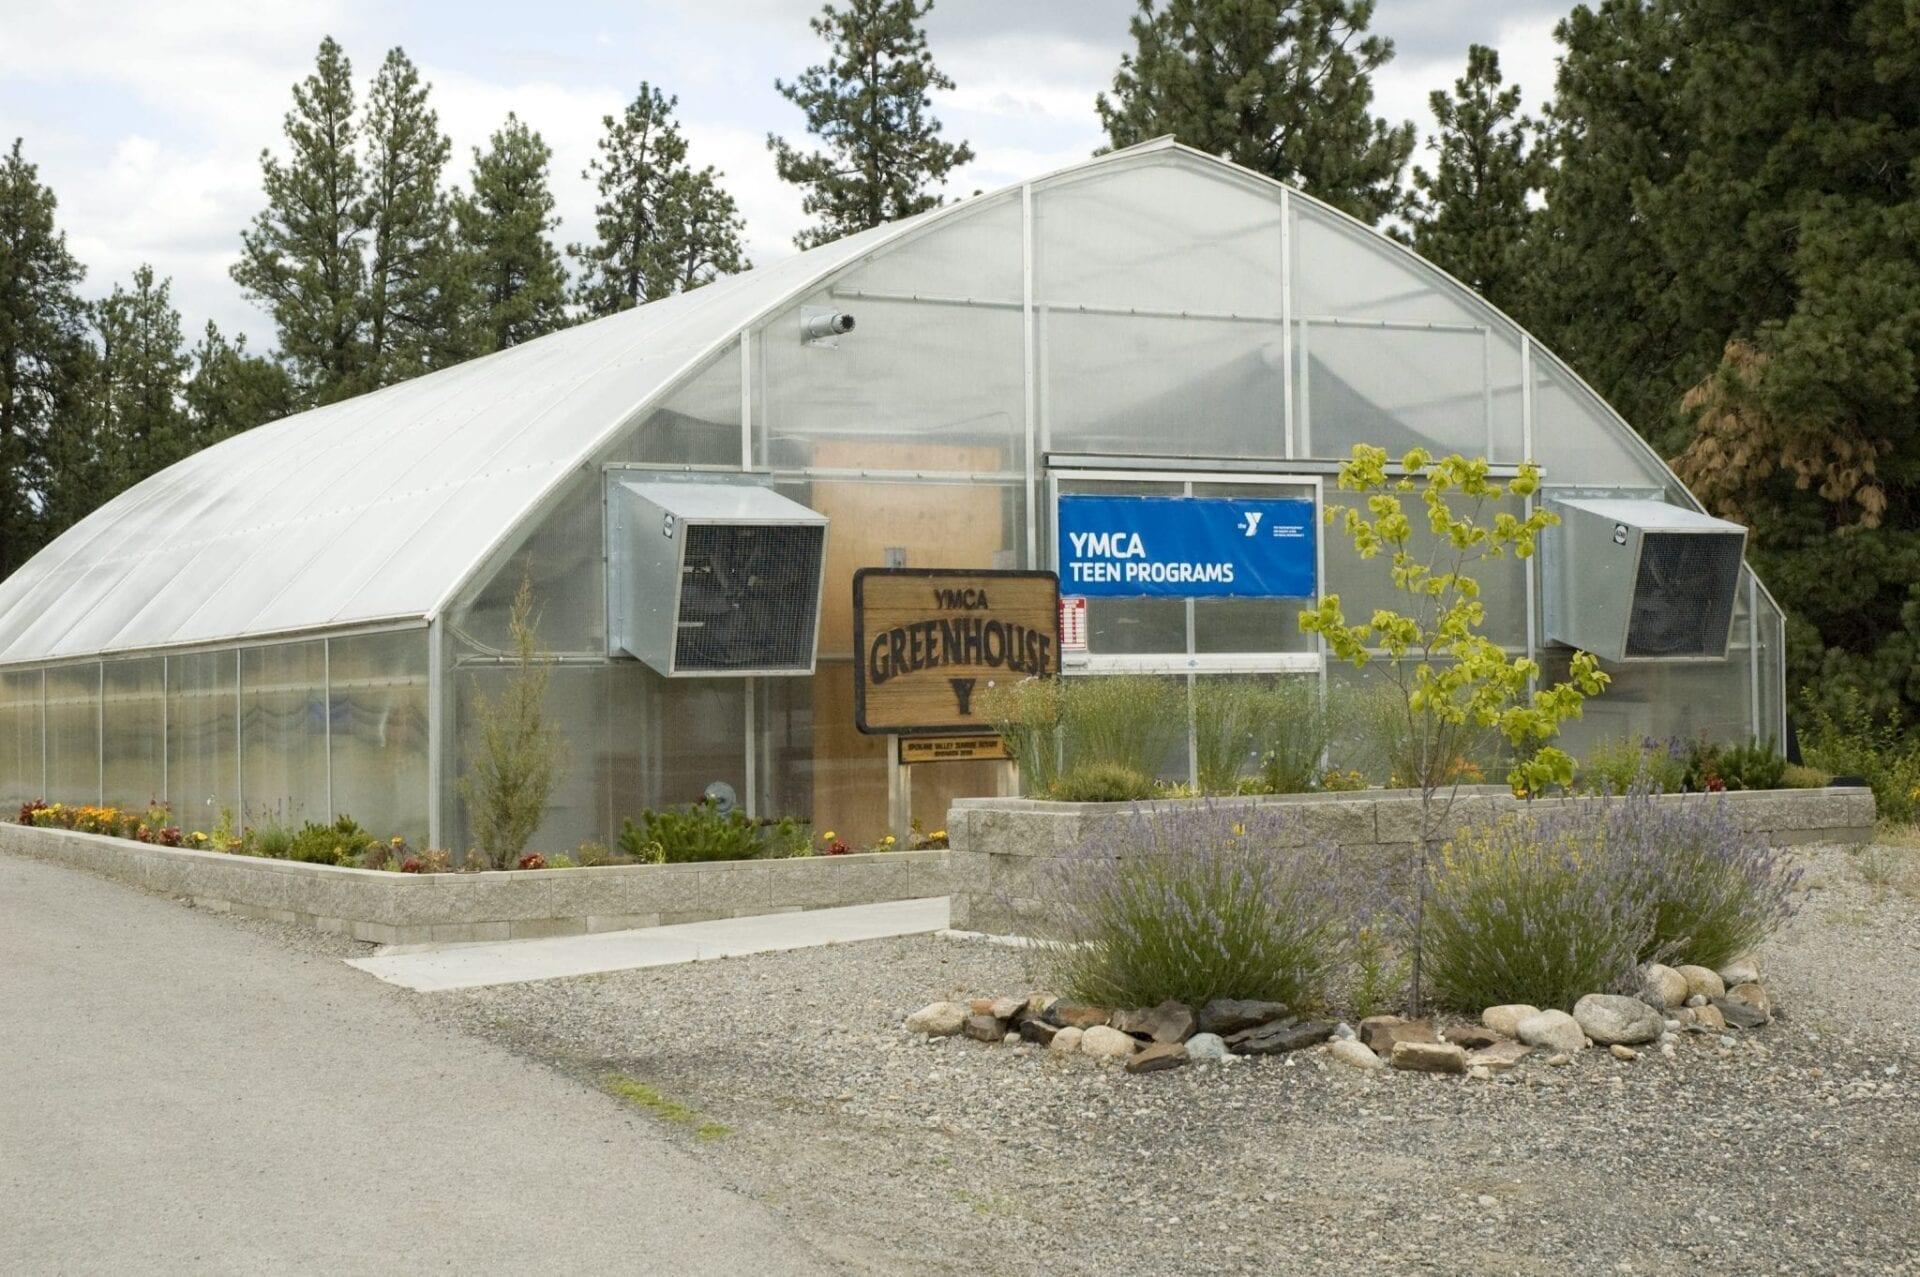 Valley YMCA Greenhouse